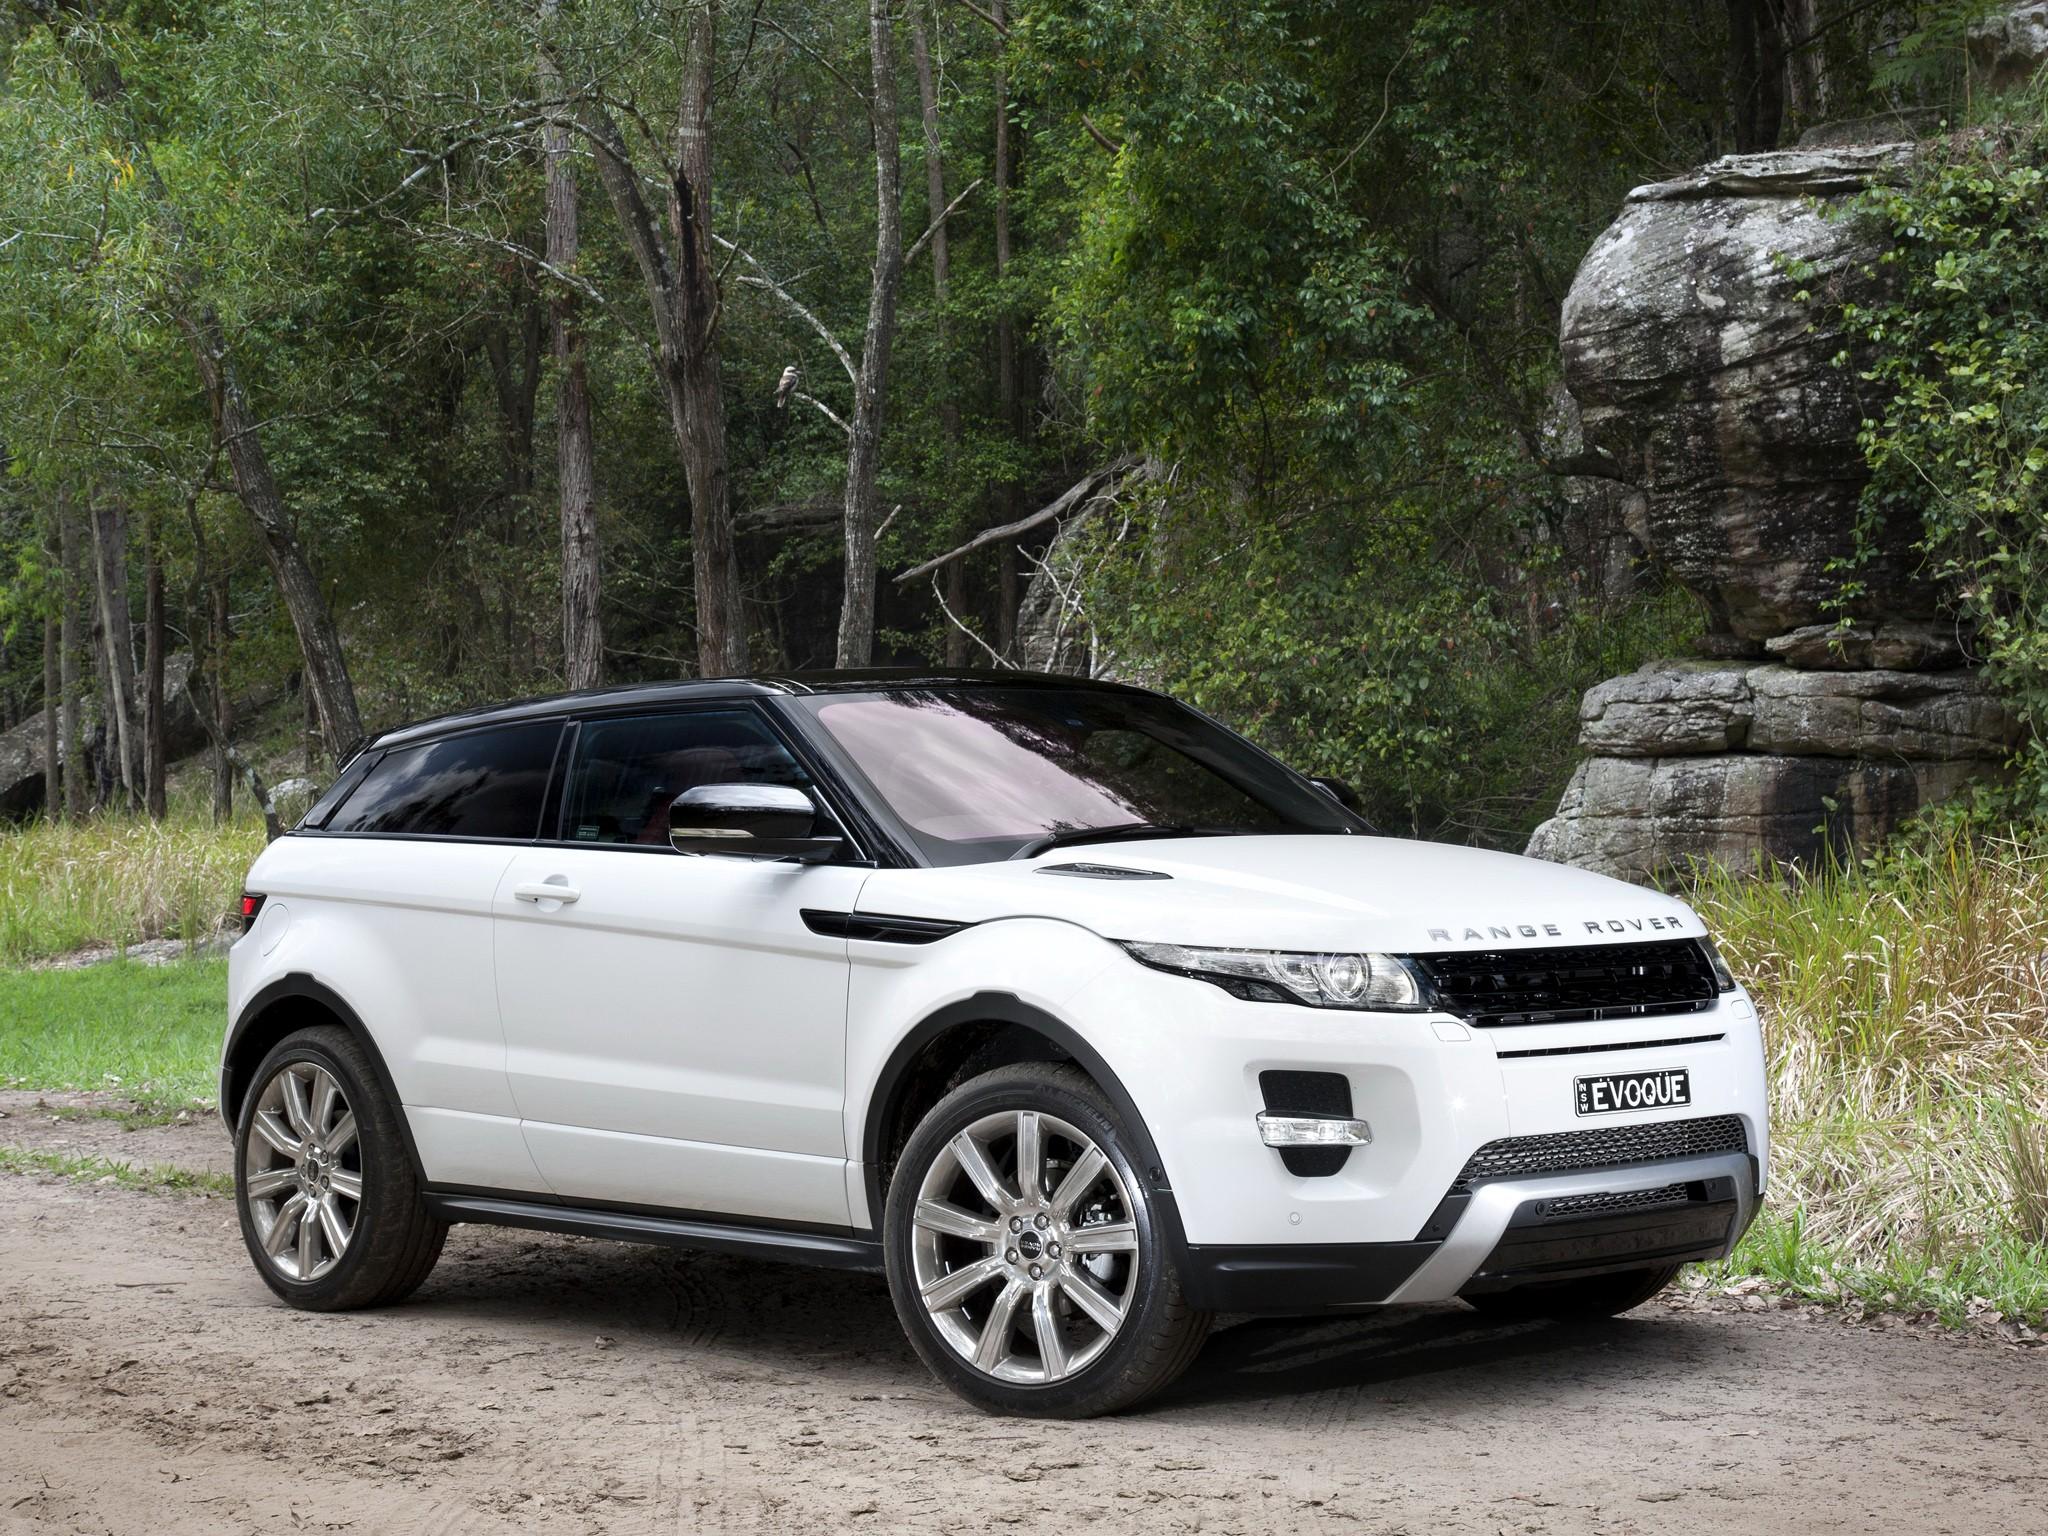 land rover range rover evoque coupe specs 2011 2012 2013 2014 2015 autoevolution. Black Bedroom Furniture Sets. Home Design Ideas